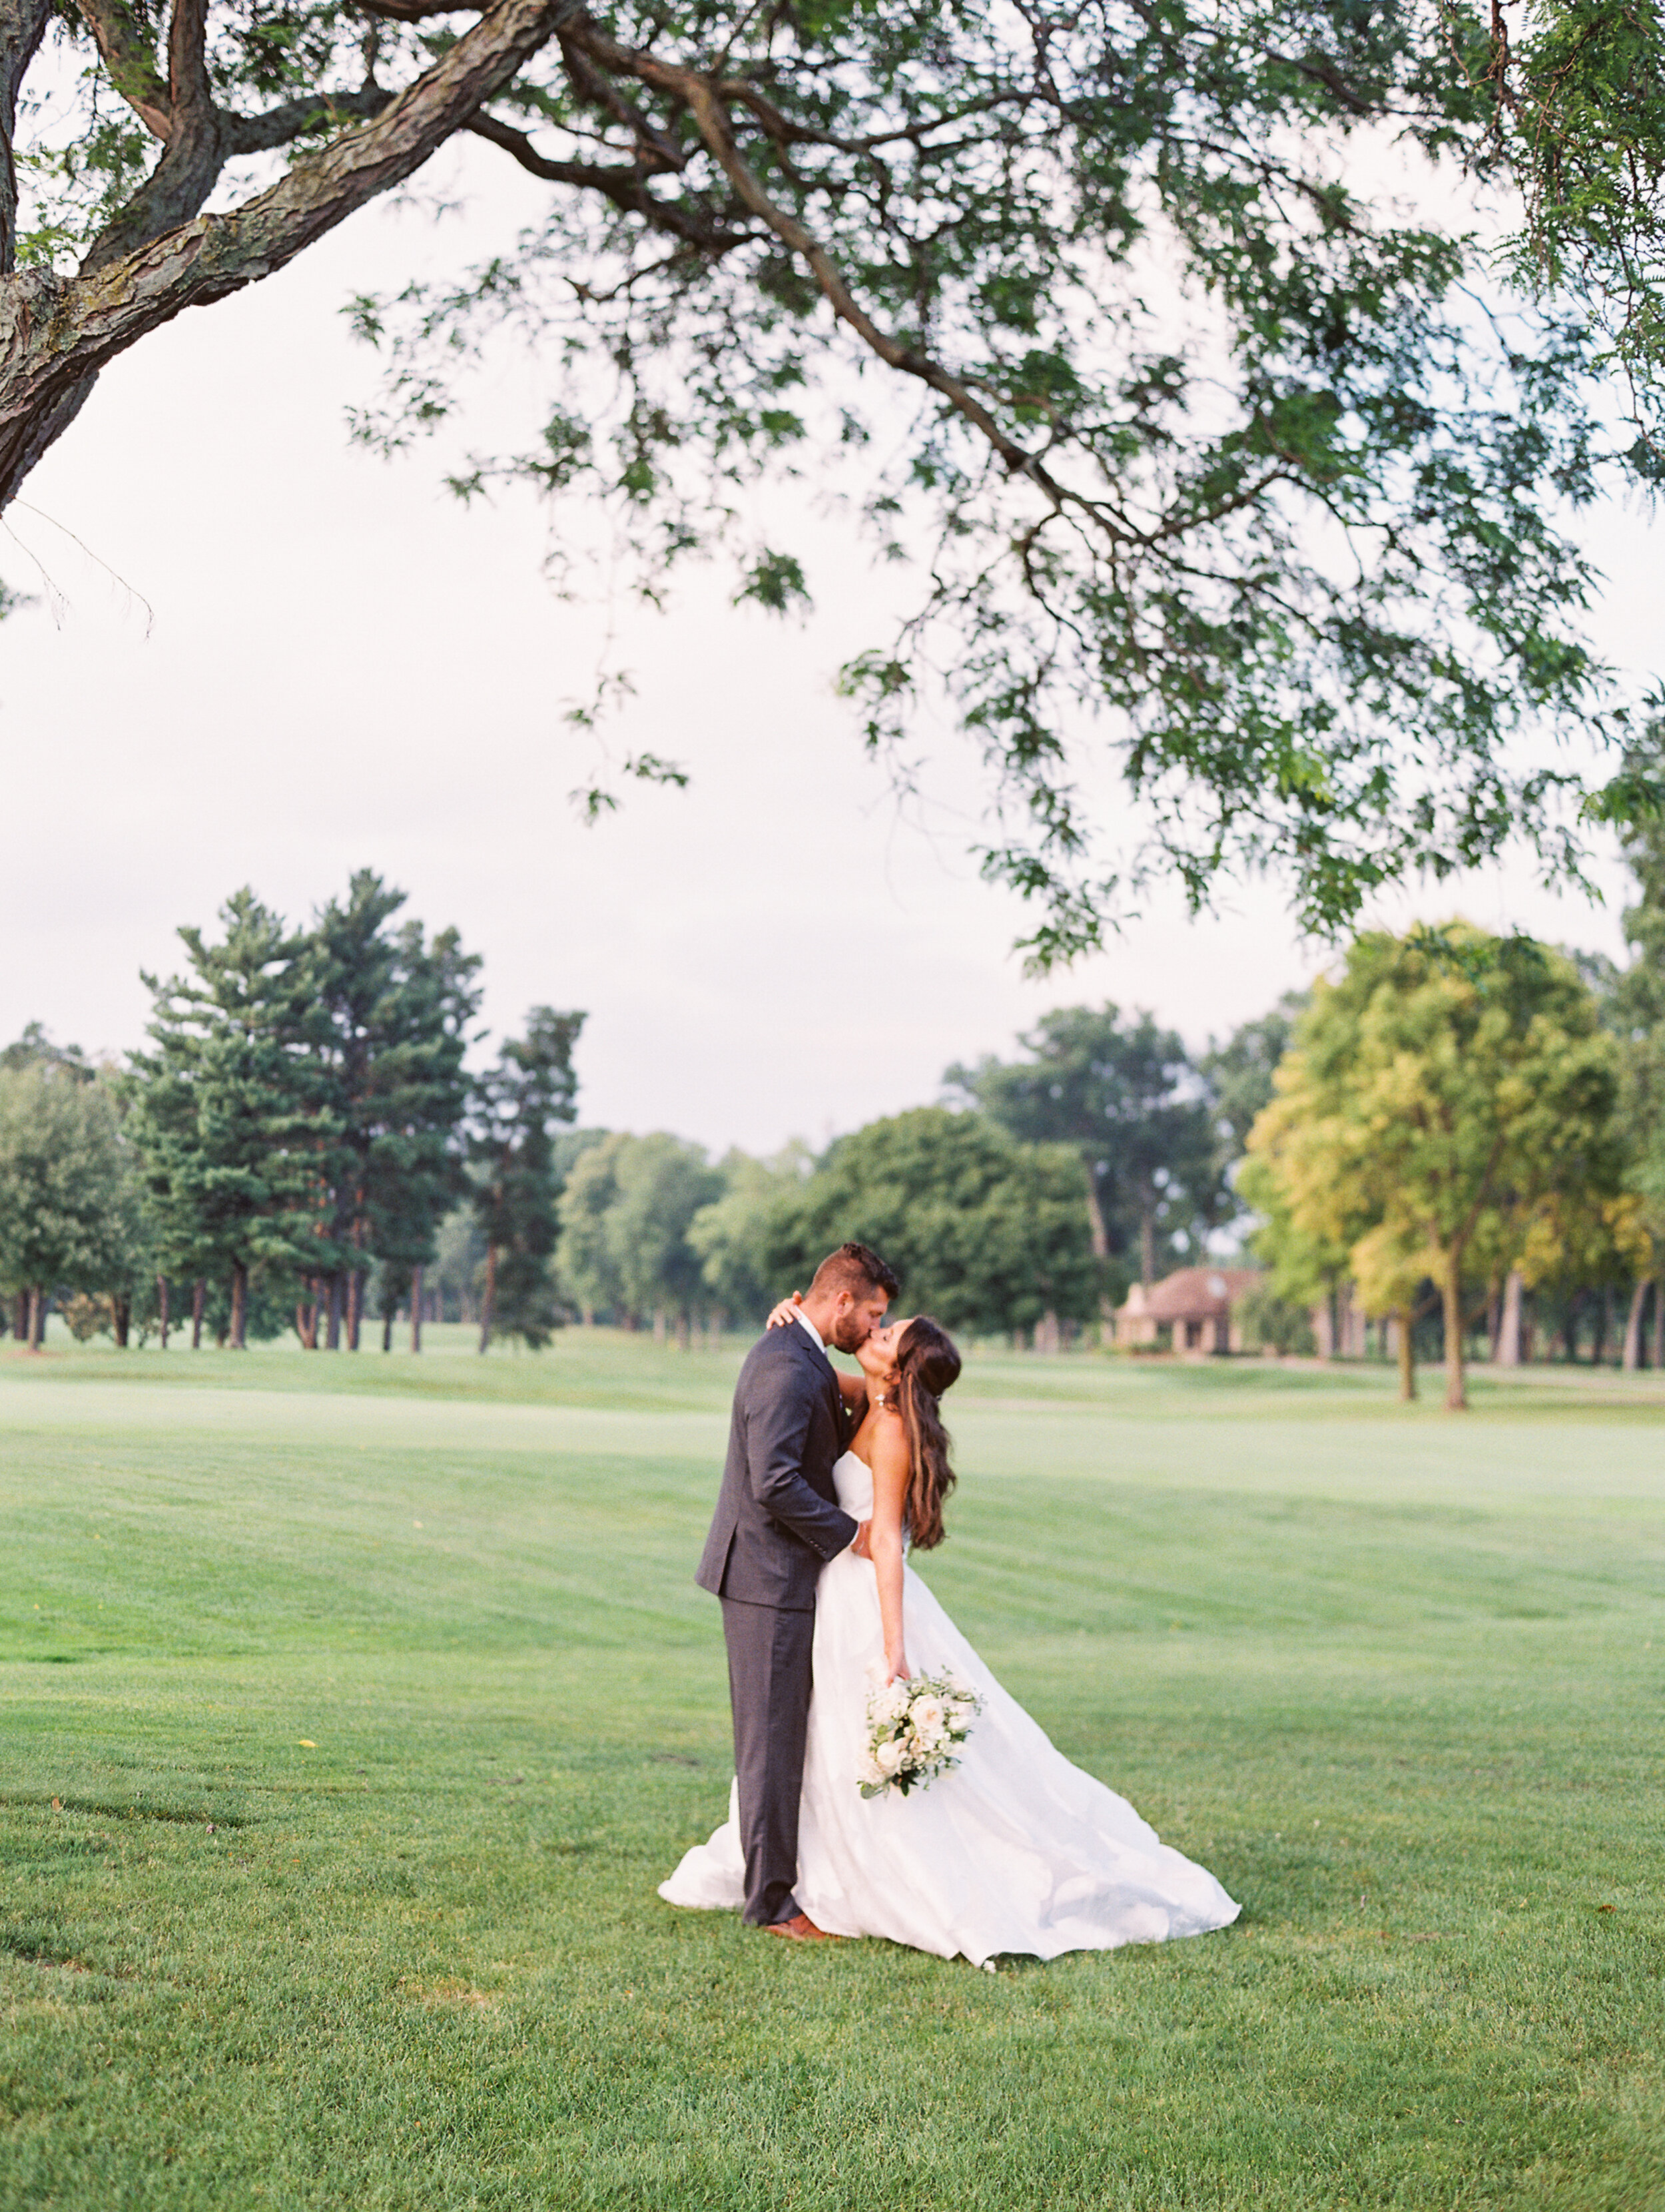 Kuiper+Wedding+Reception+Bridal+Party-170.jpg